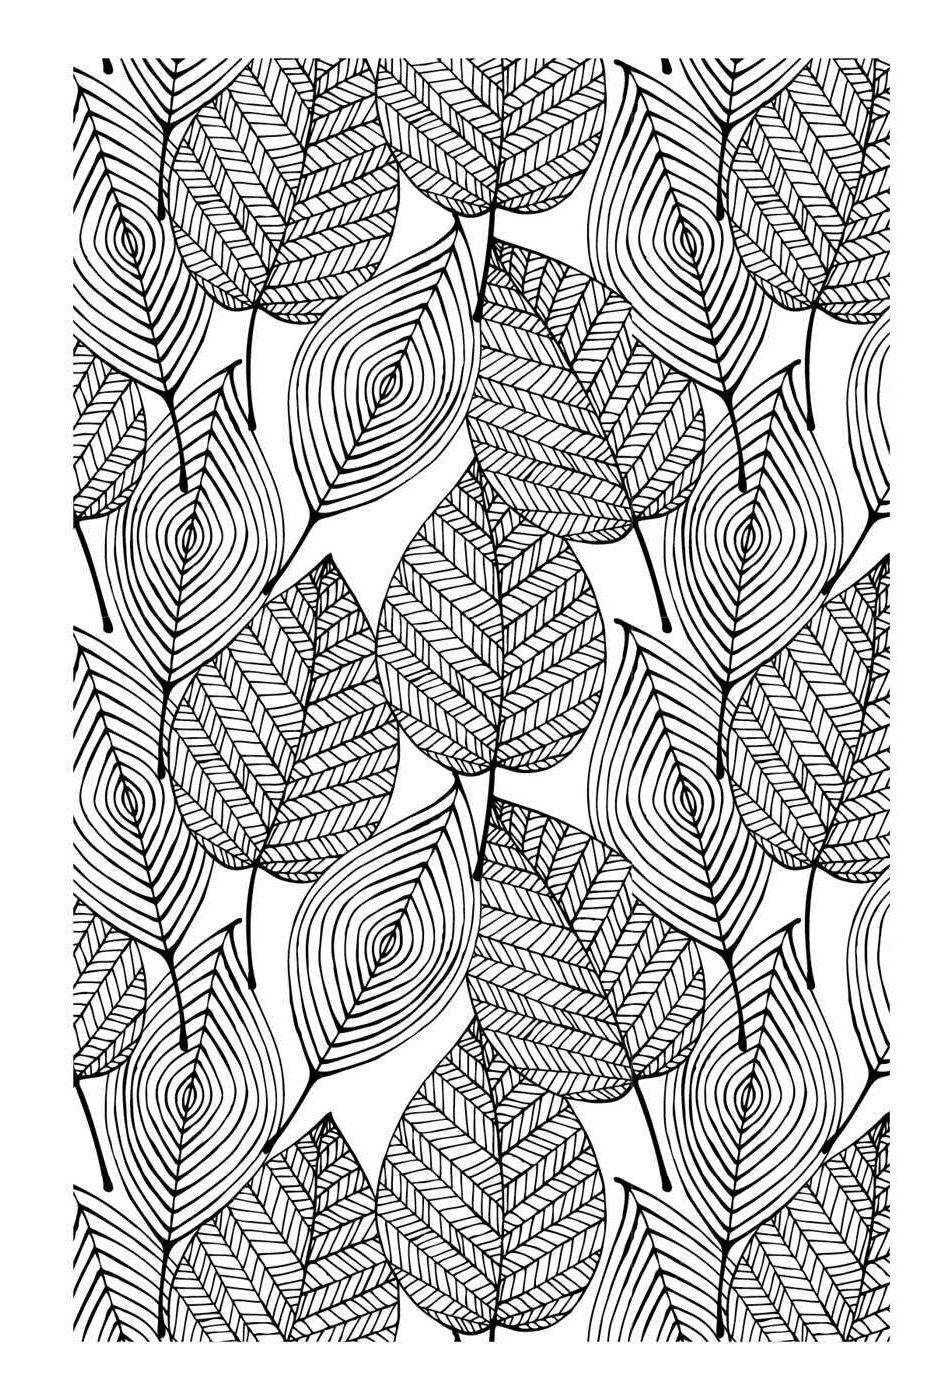 Pin By Lisa Teich On Color Me Mandala Design Art Doodle Art Drawing Pattern Art